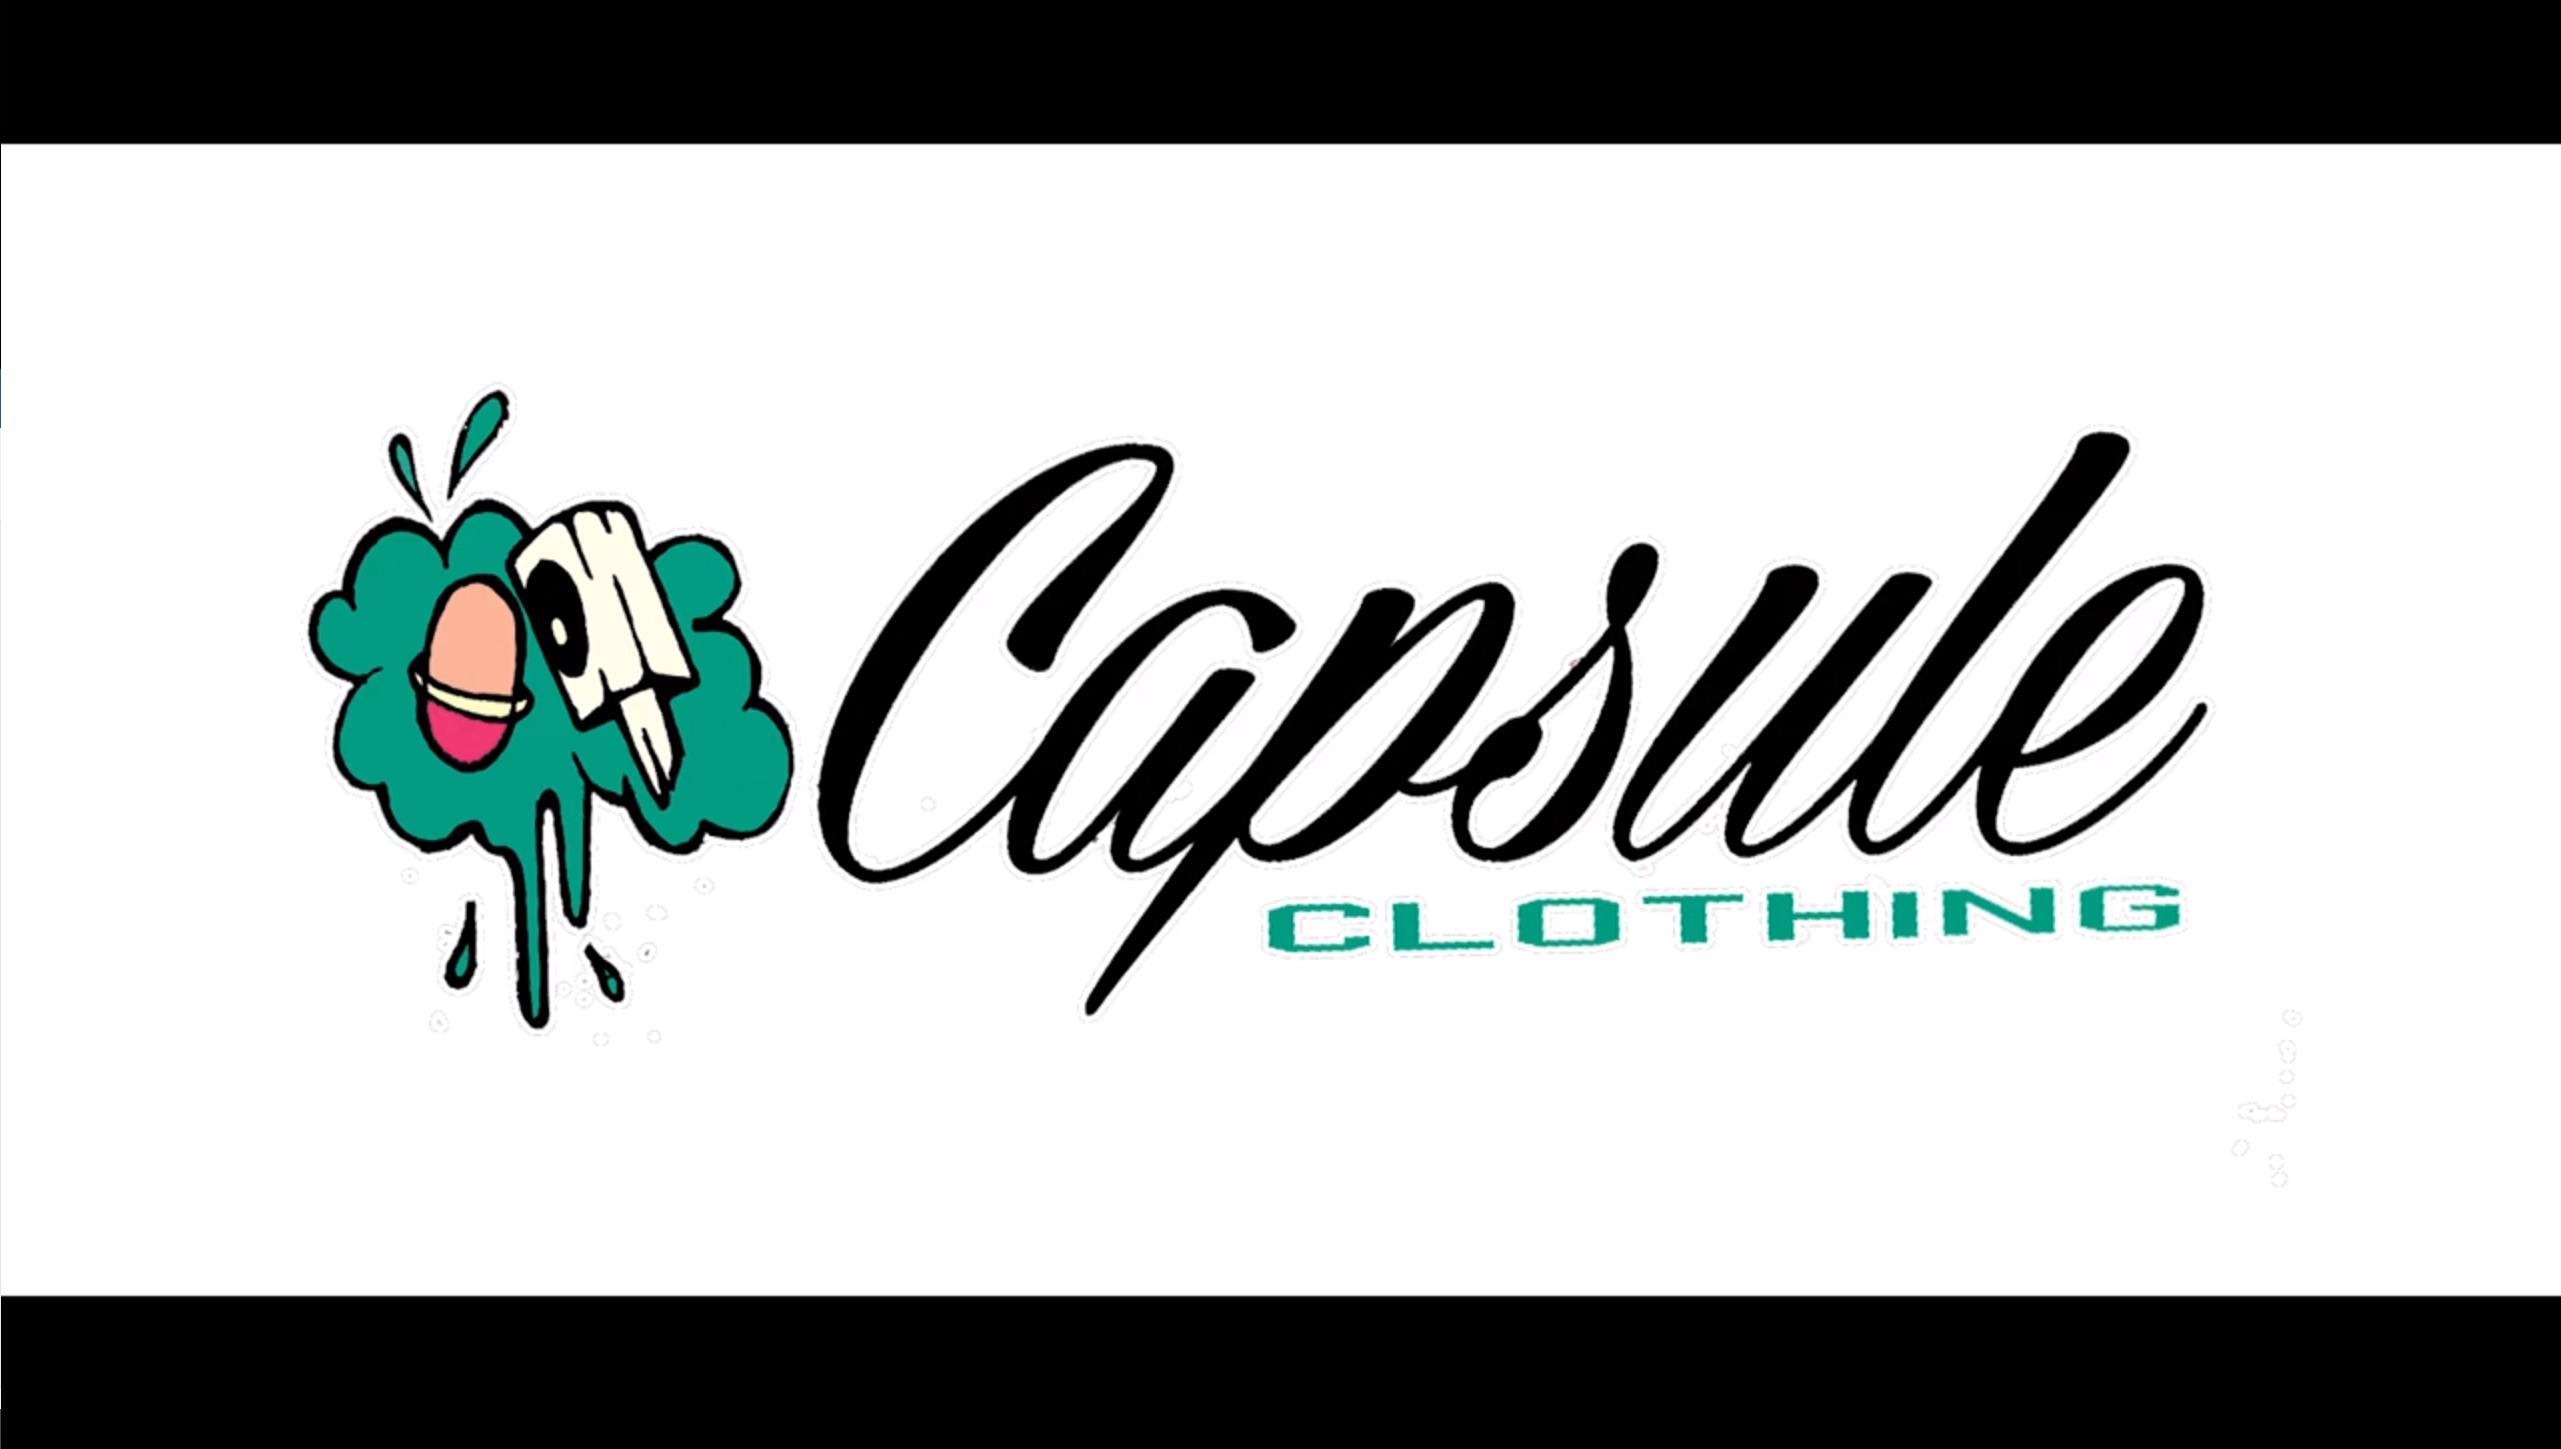 Spot Capsule clothing – è moda presenta capsule city color